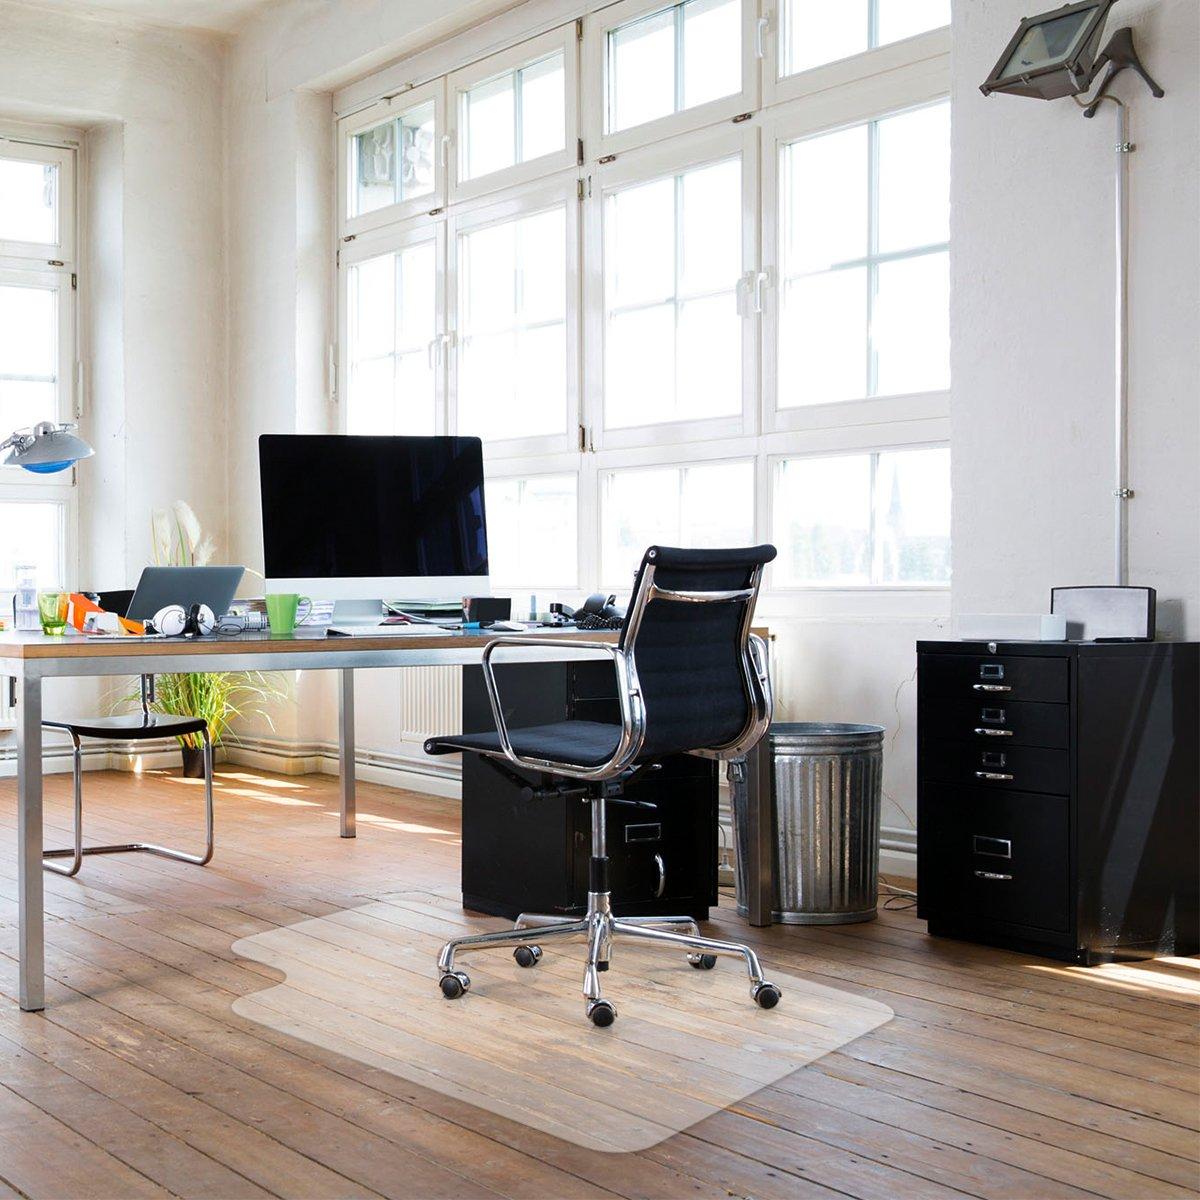 Amazoncom Sturdy Desk Chair Mat For Hardwood Floors Transparent